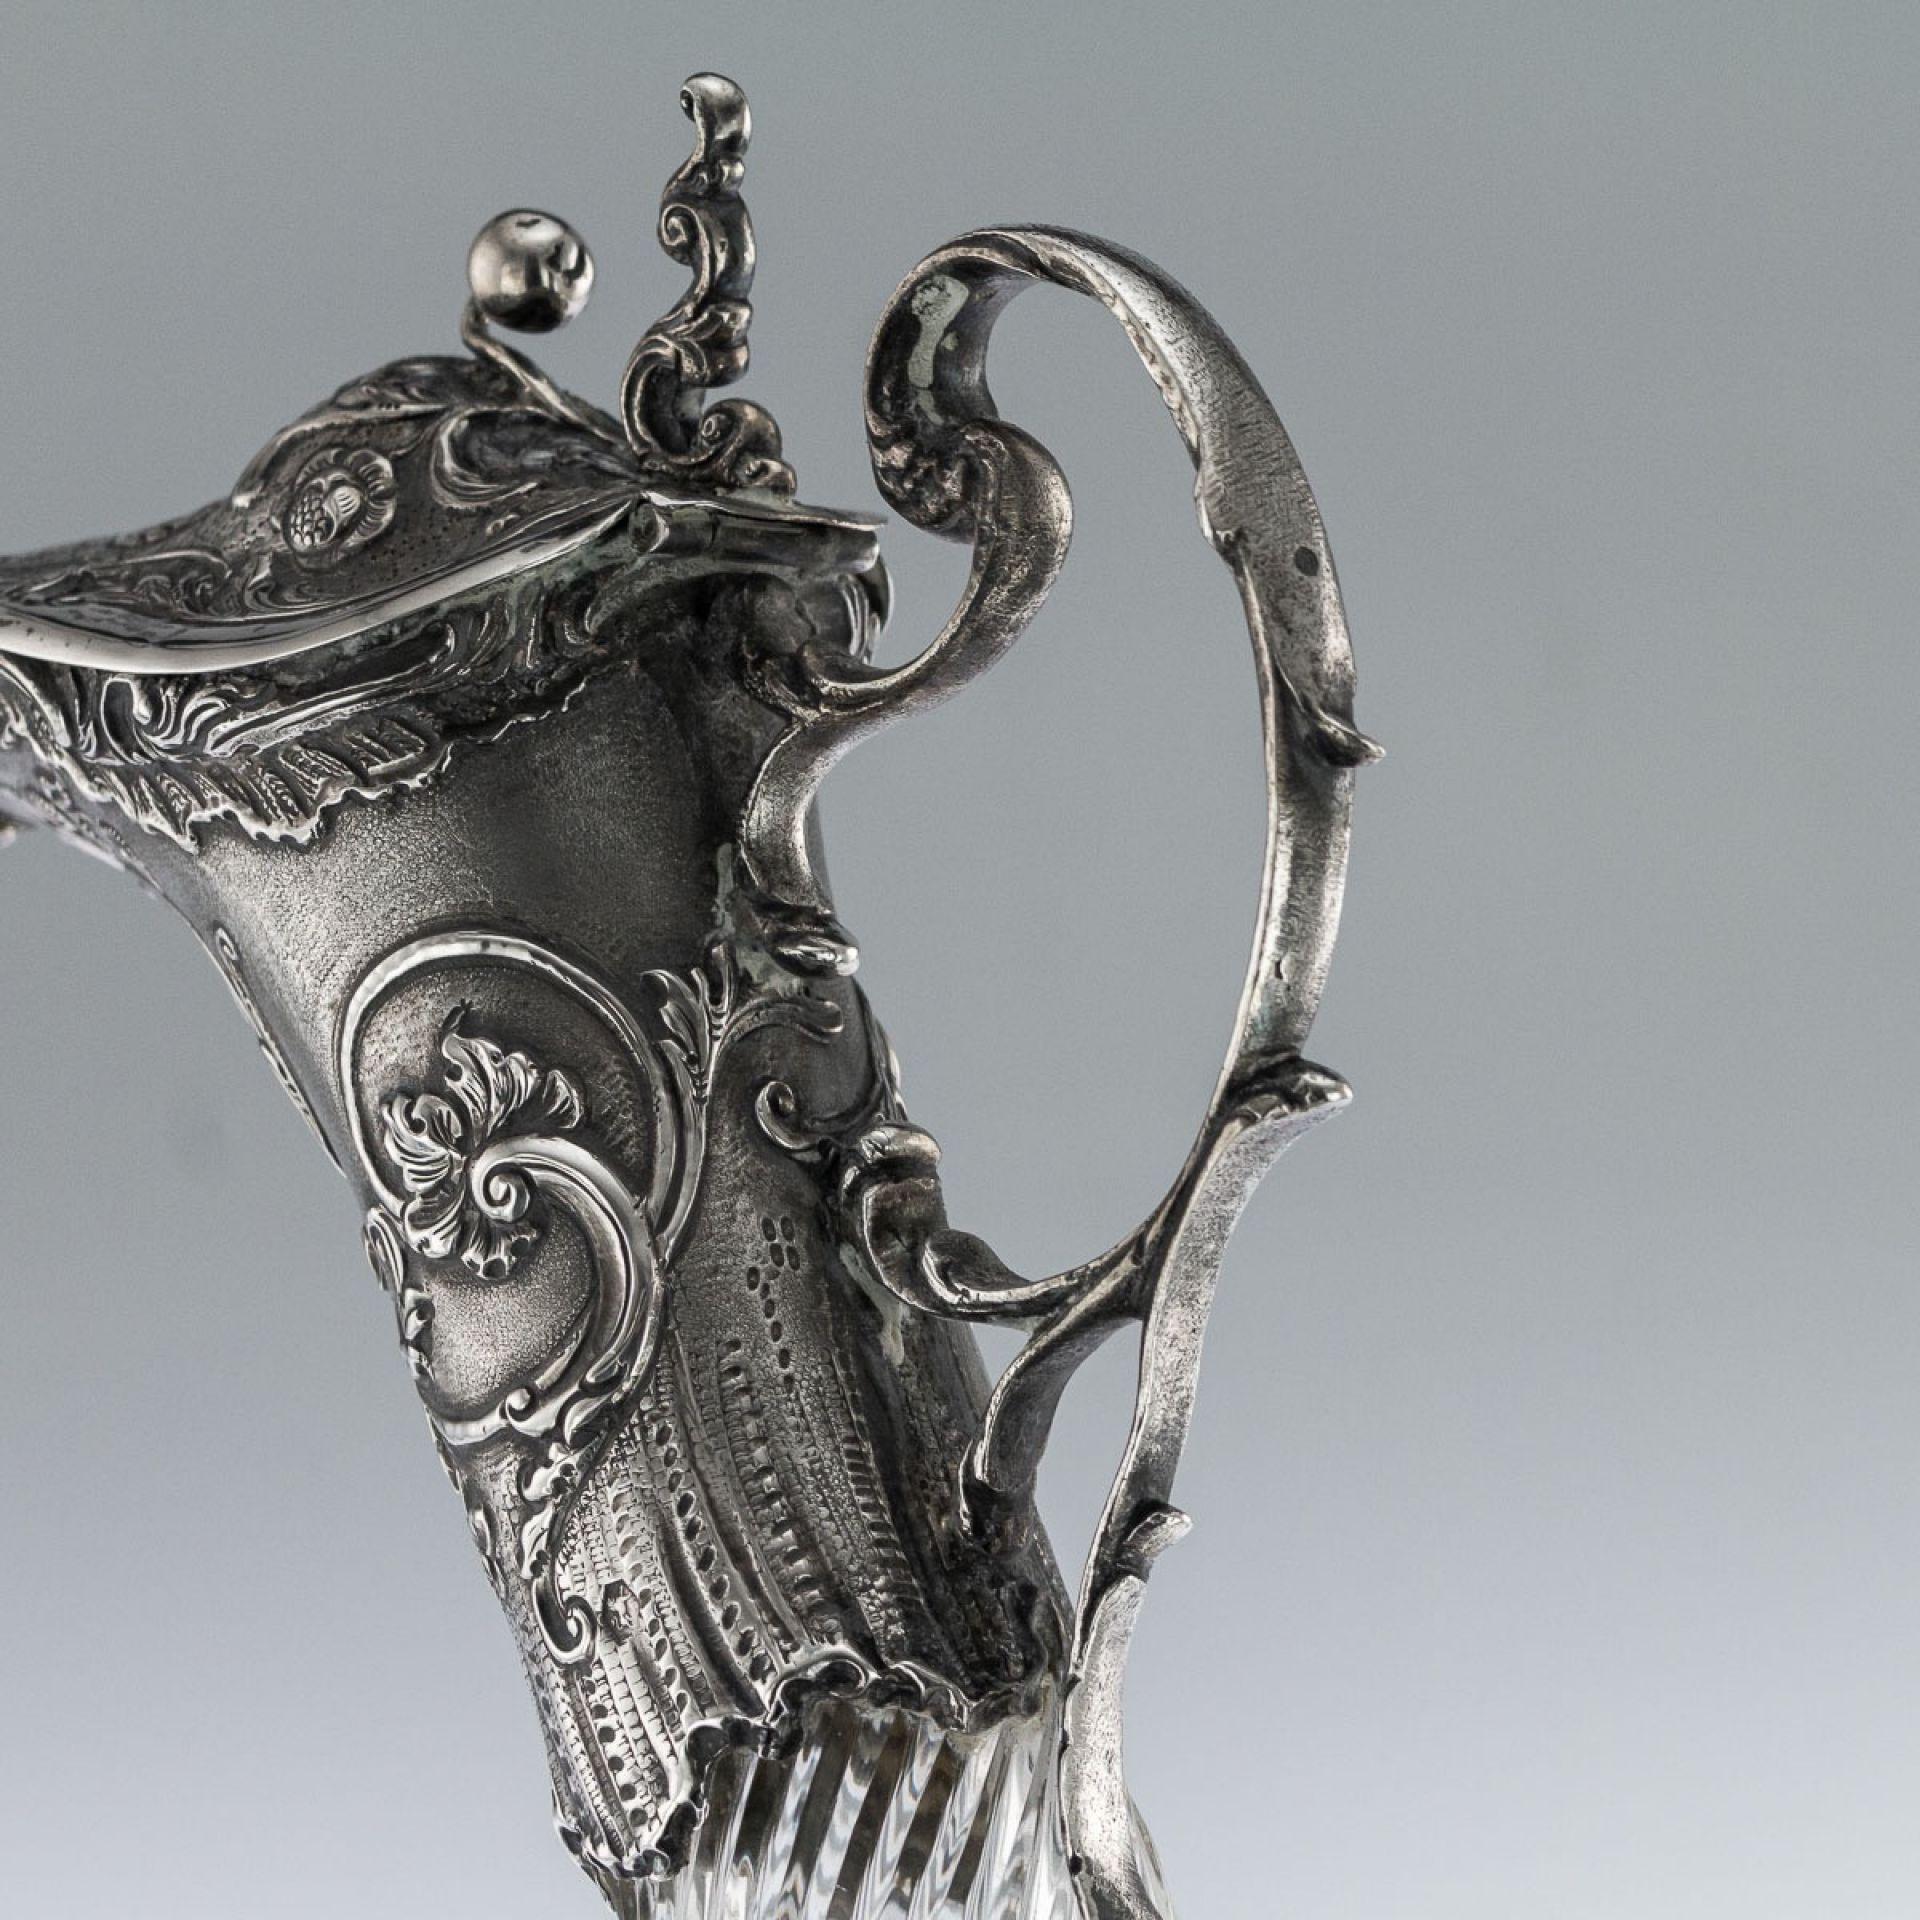 ANTIQUE 20thC DUTCH SOLID SILVER MOUNTED GLASS DECORATIVE CLARET JUG c.1900